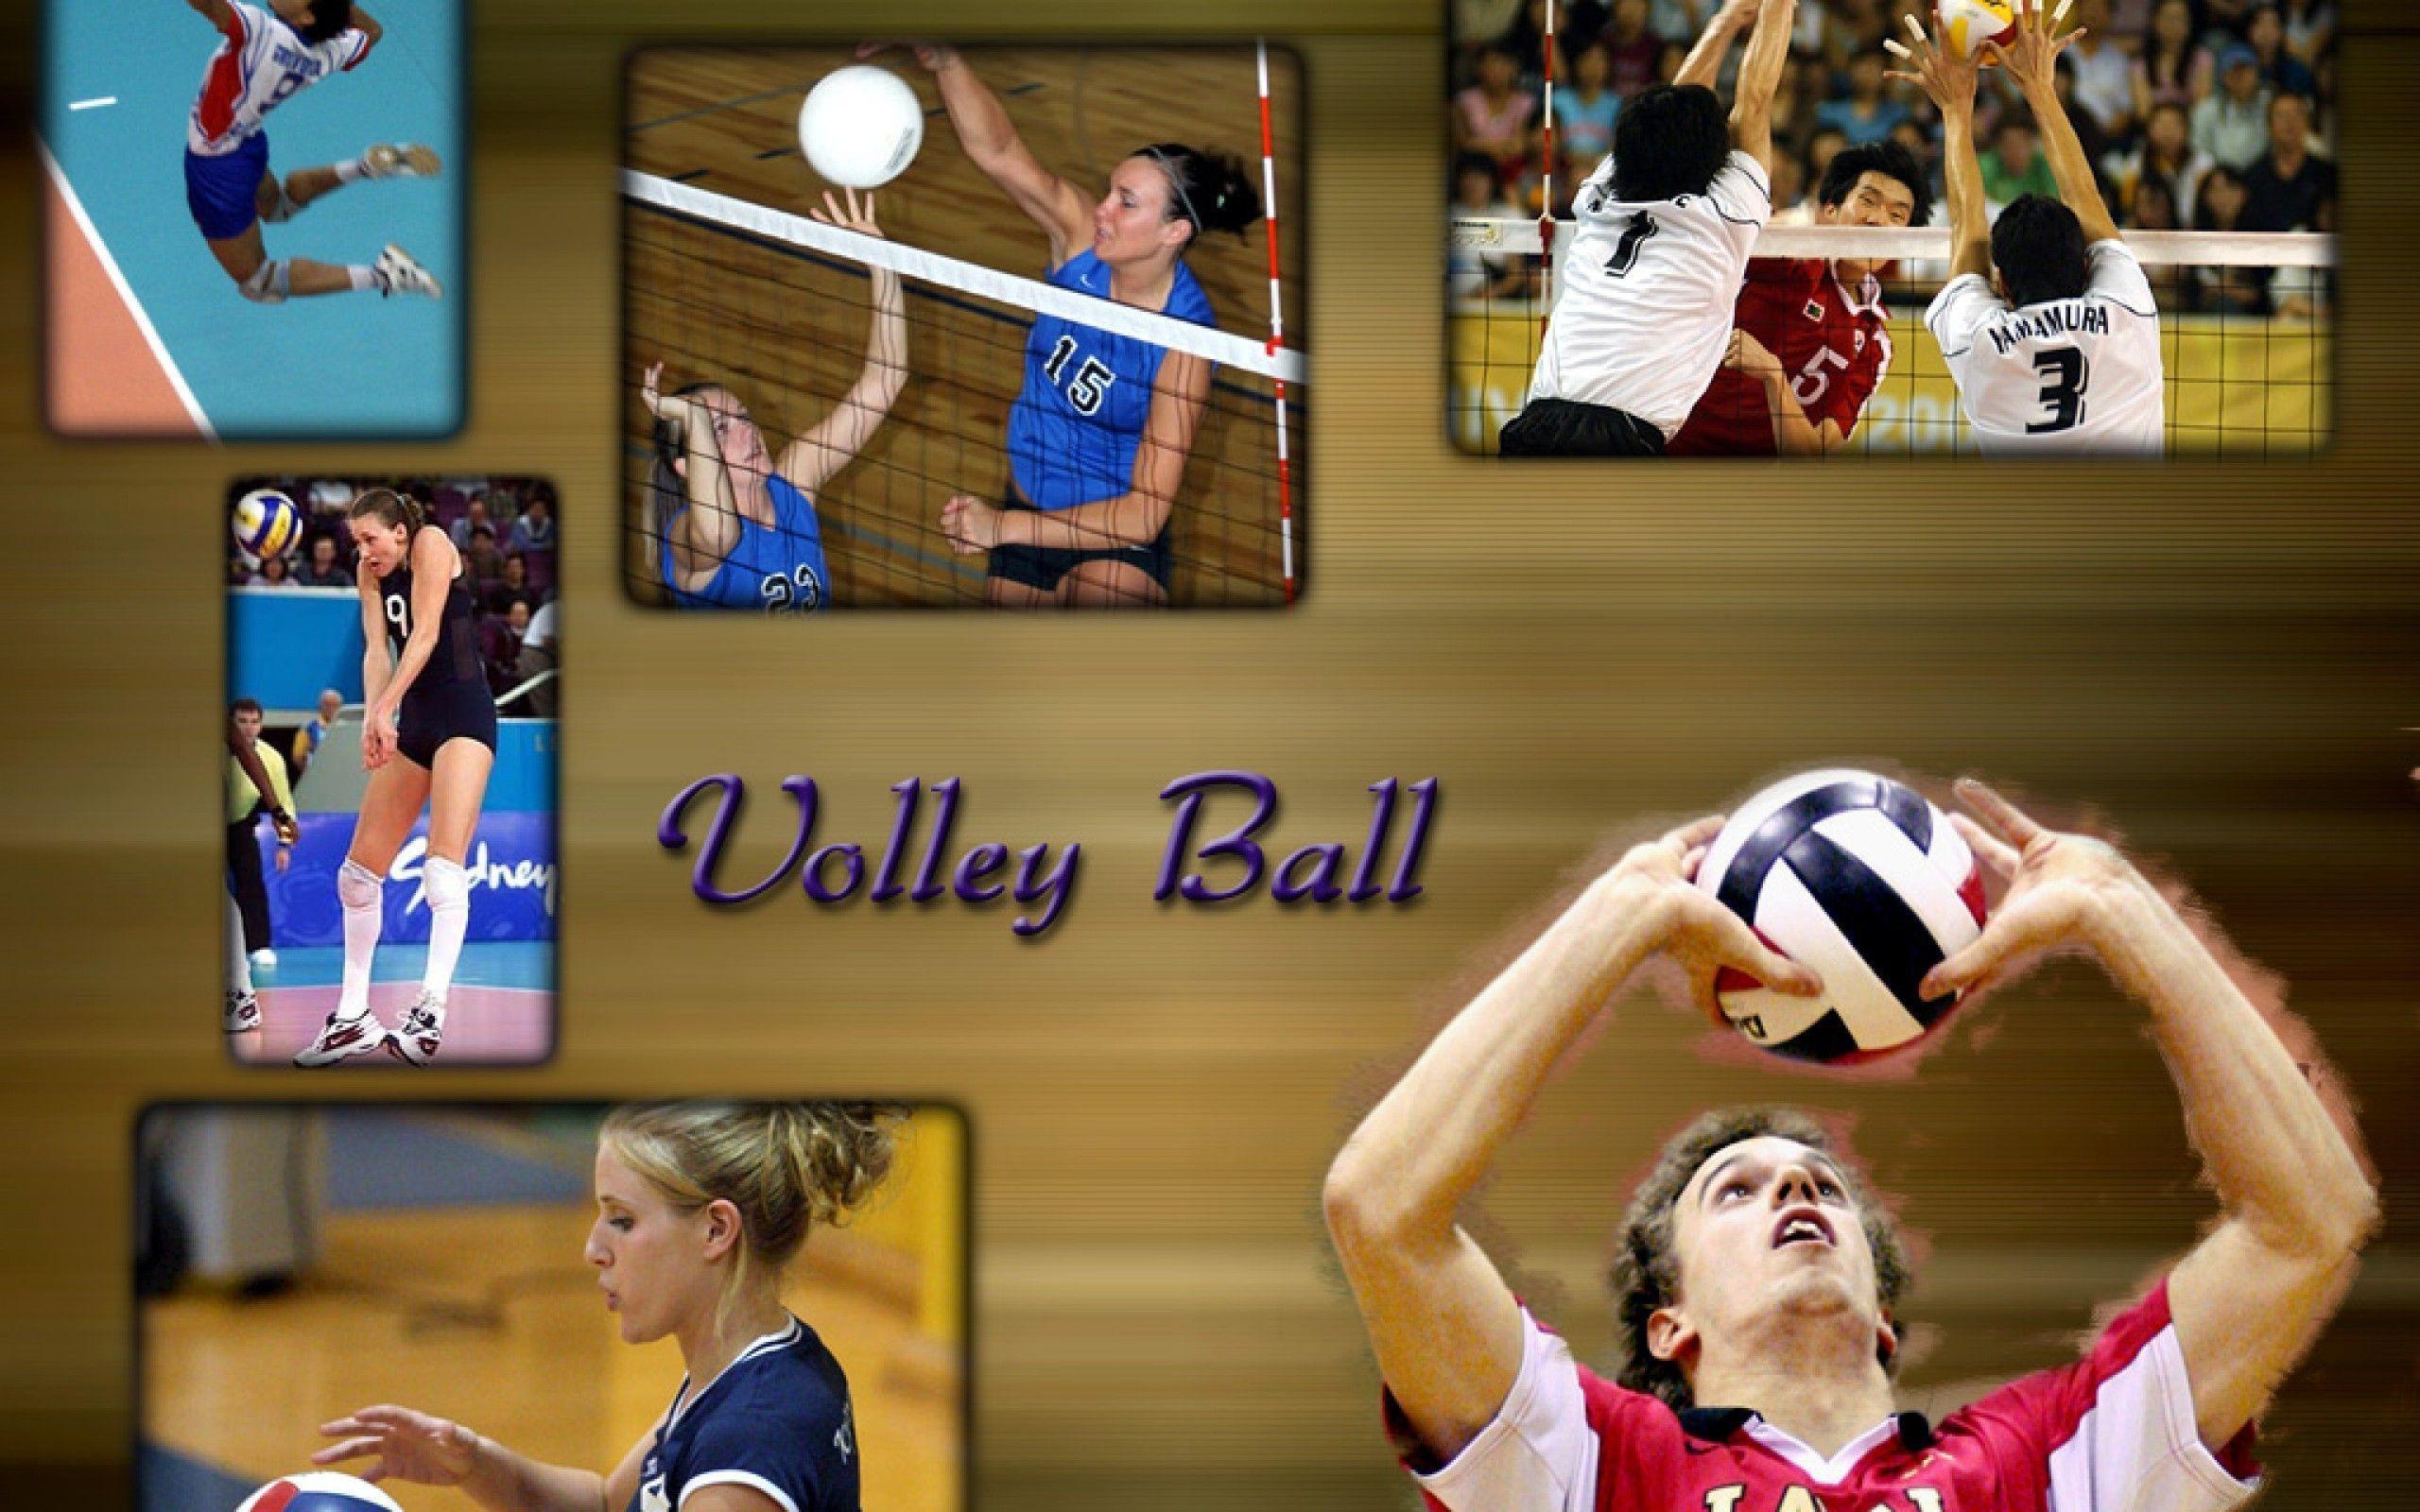 Volleyball 20868 – Volleyball Wallpaper